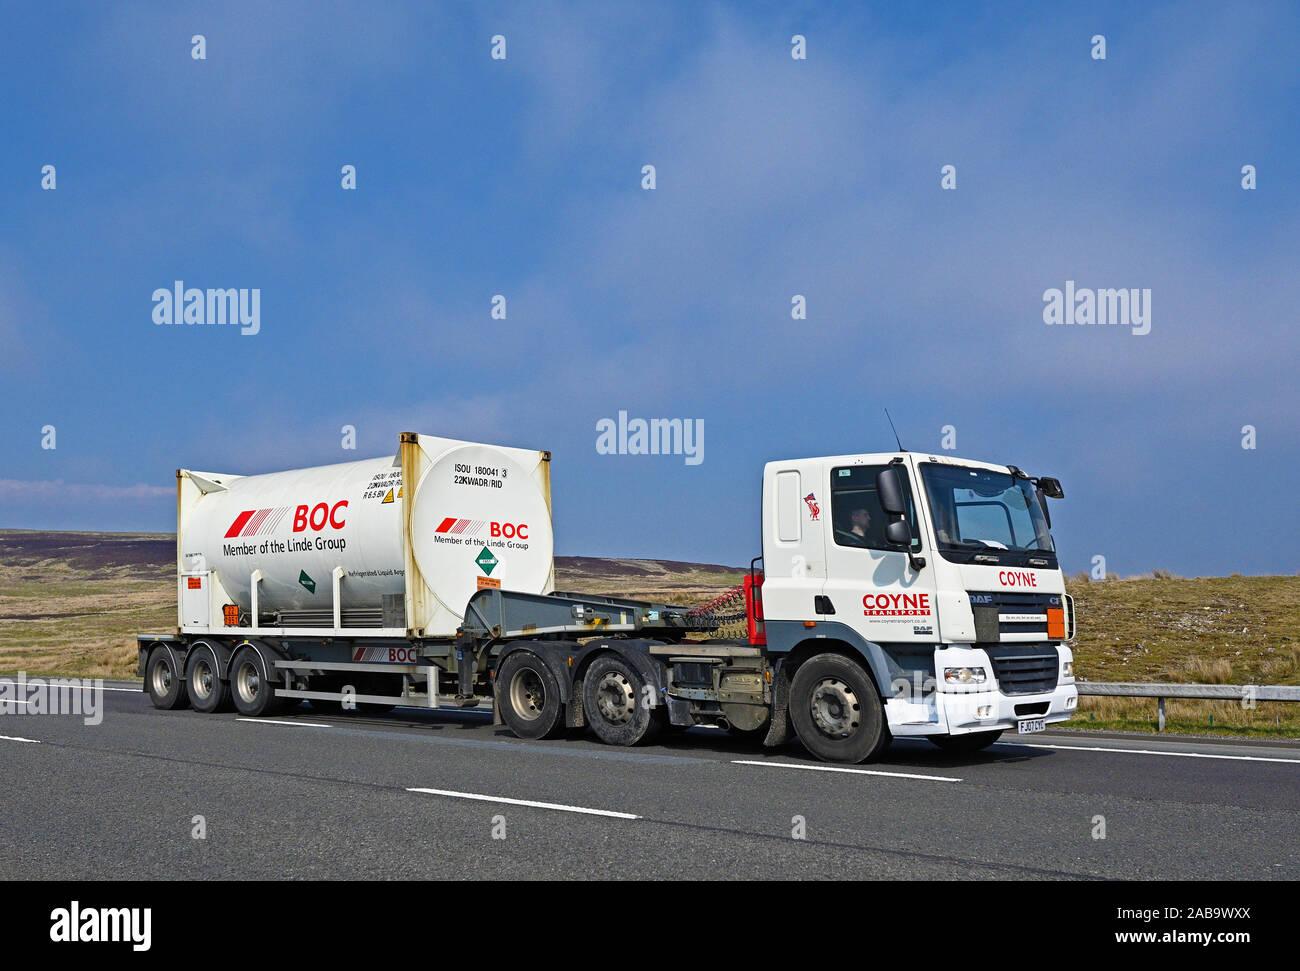 coyne-transport-hgv-with-boc-tanker-trailer-m6-motorway-southbound-shap-cumbria-england-united-kingdom-europe-2AB9WXX.jpg